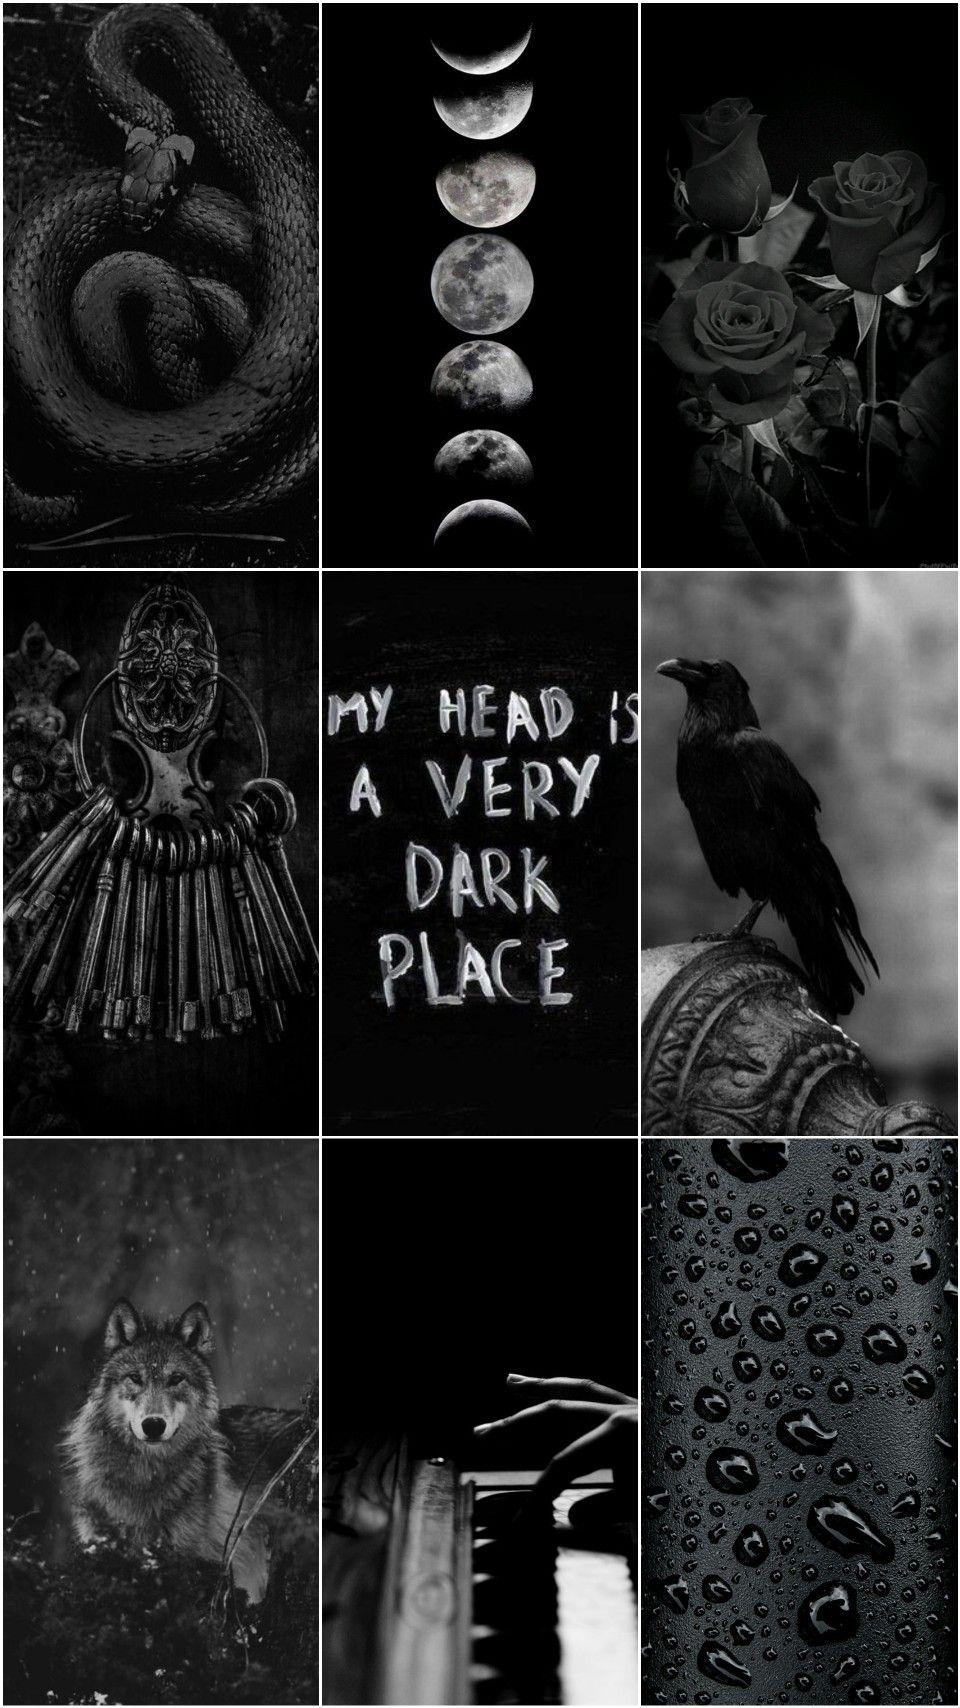 Dark Black Emo Wallpaper Aesthetic Emo Wallpaper Aesthetic Wallpapers Wallpaper